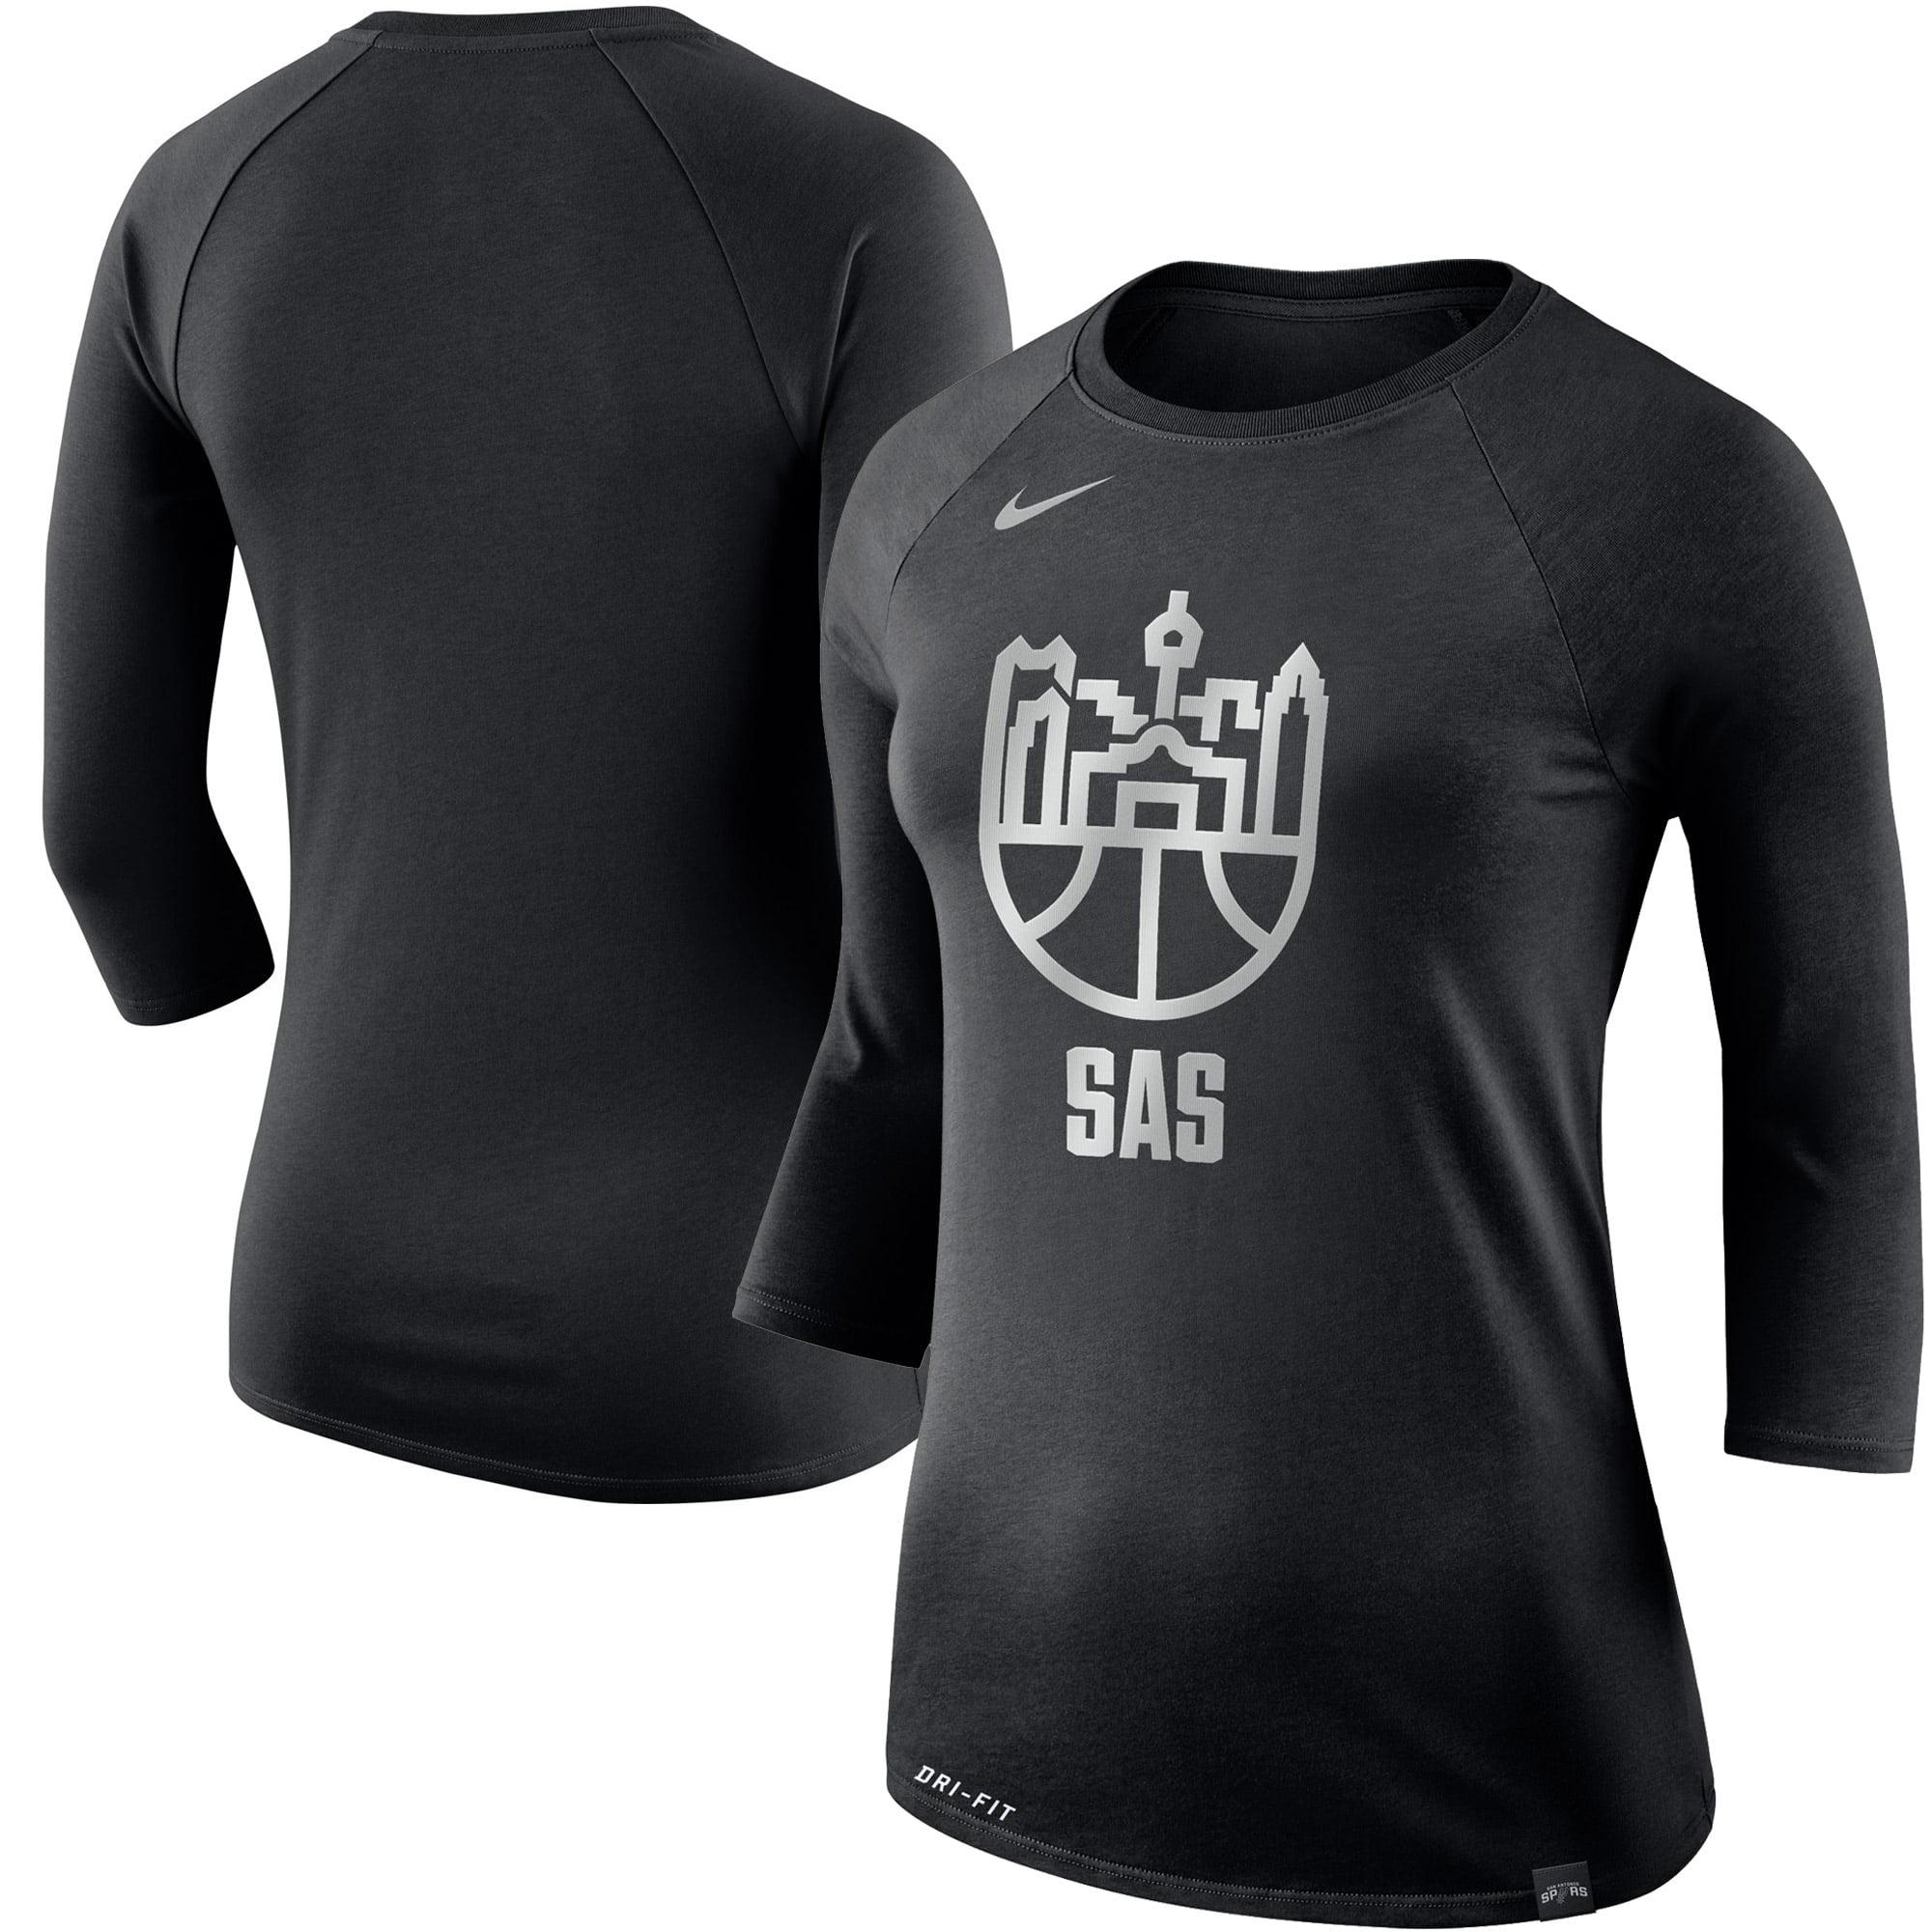 San Antonio Spurs Nike Women's Cityscape 3/4-Length Sleeve T-Shirt - Black